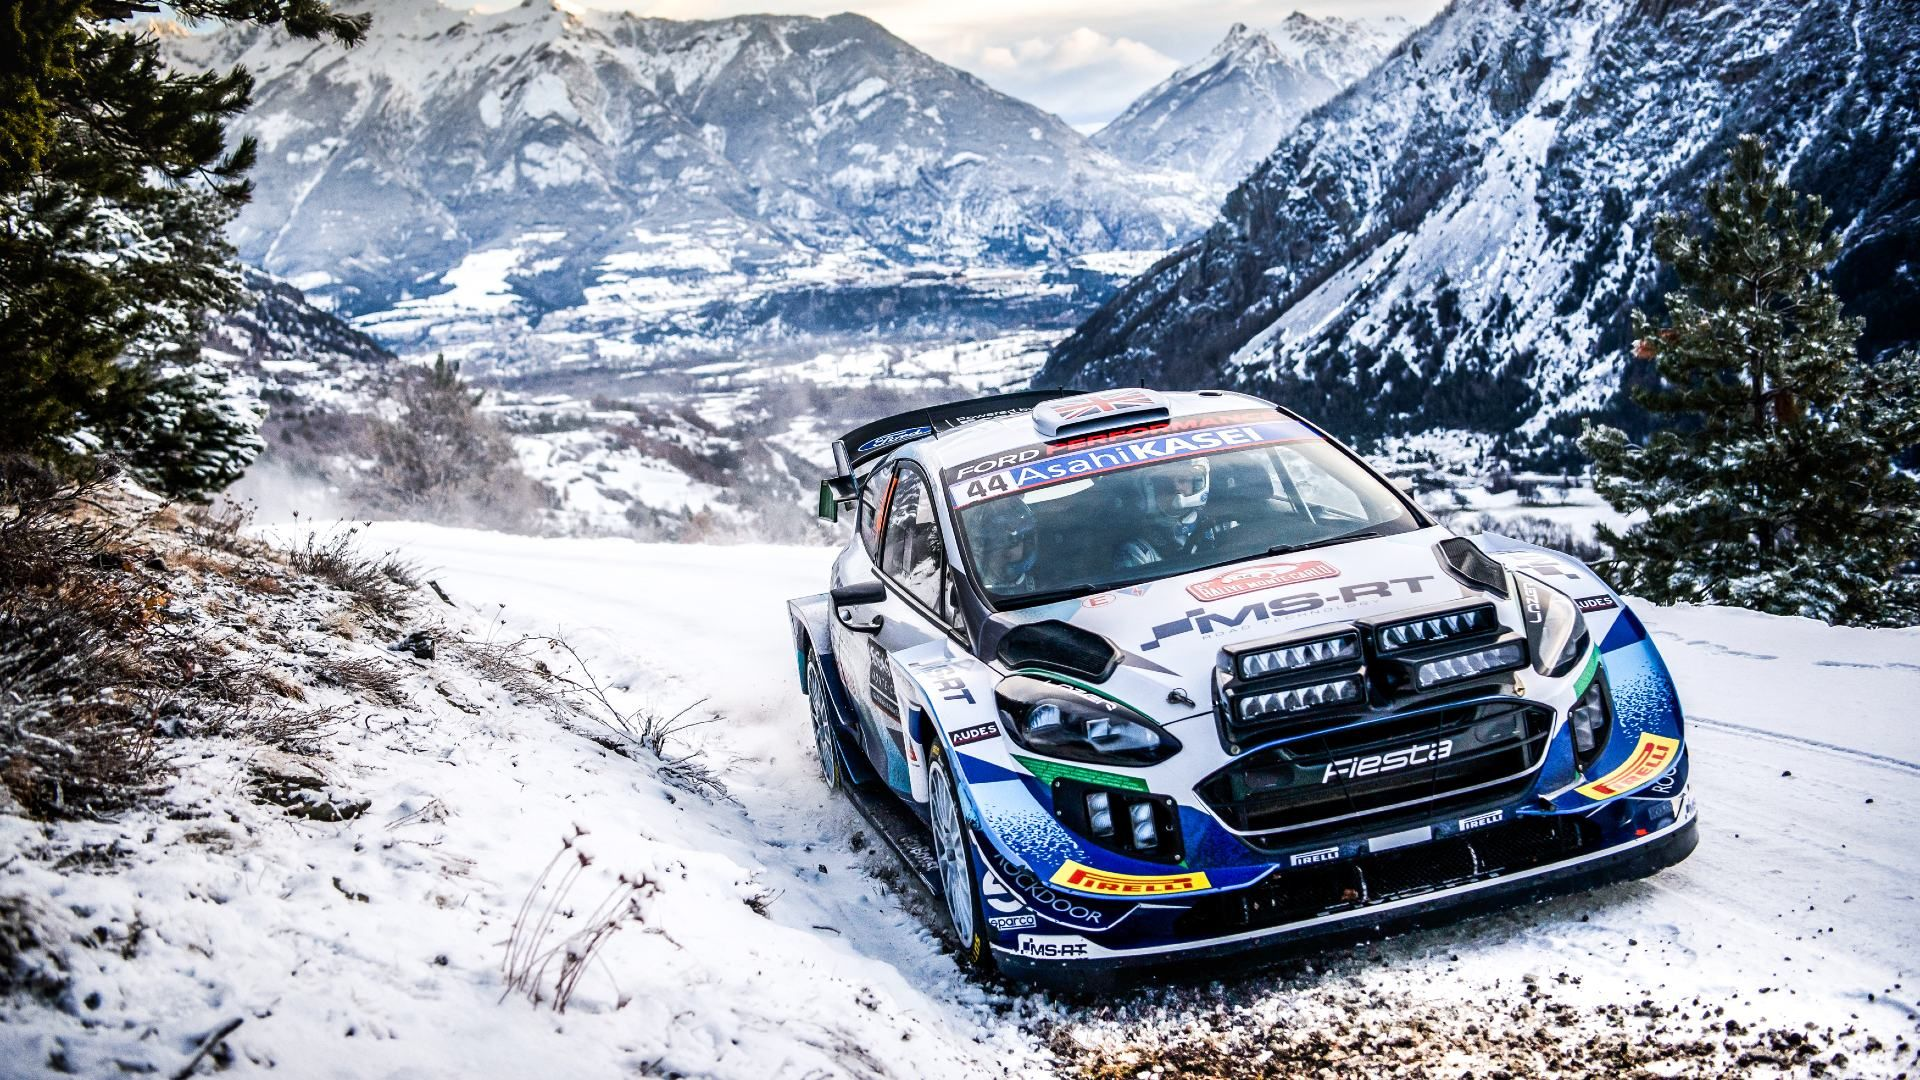 Monaco base for new-look Rallye Monte-Carlo